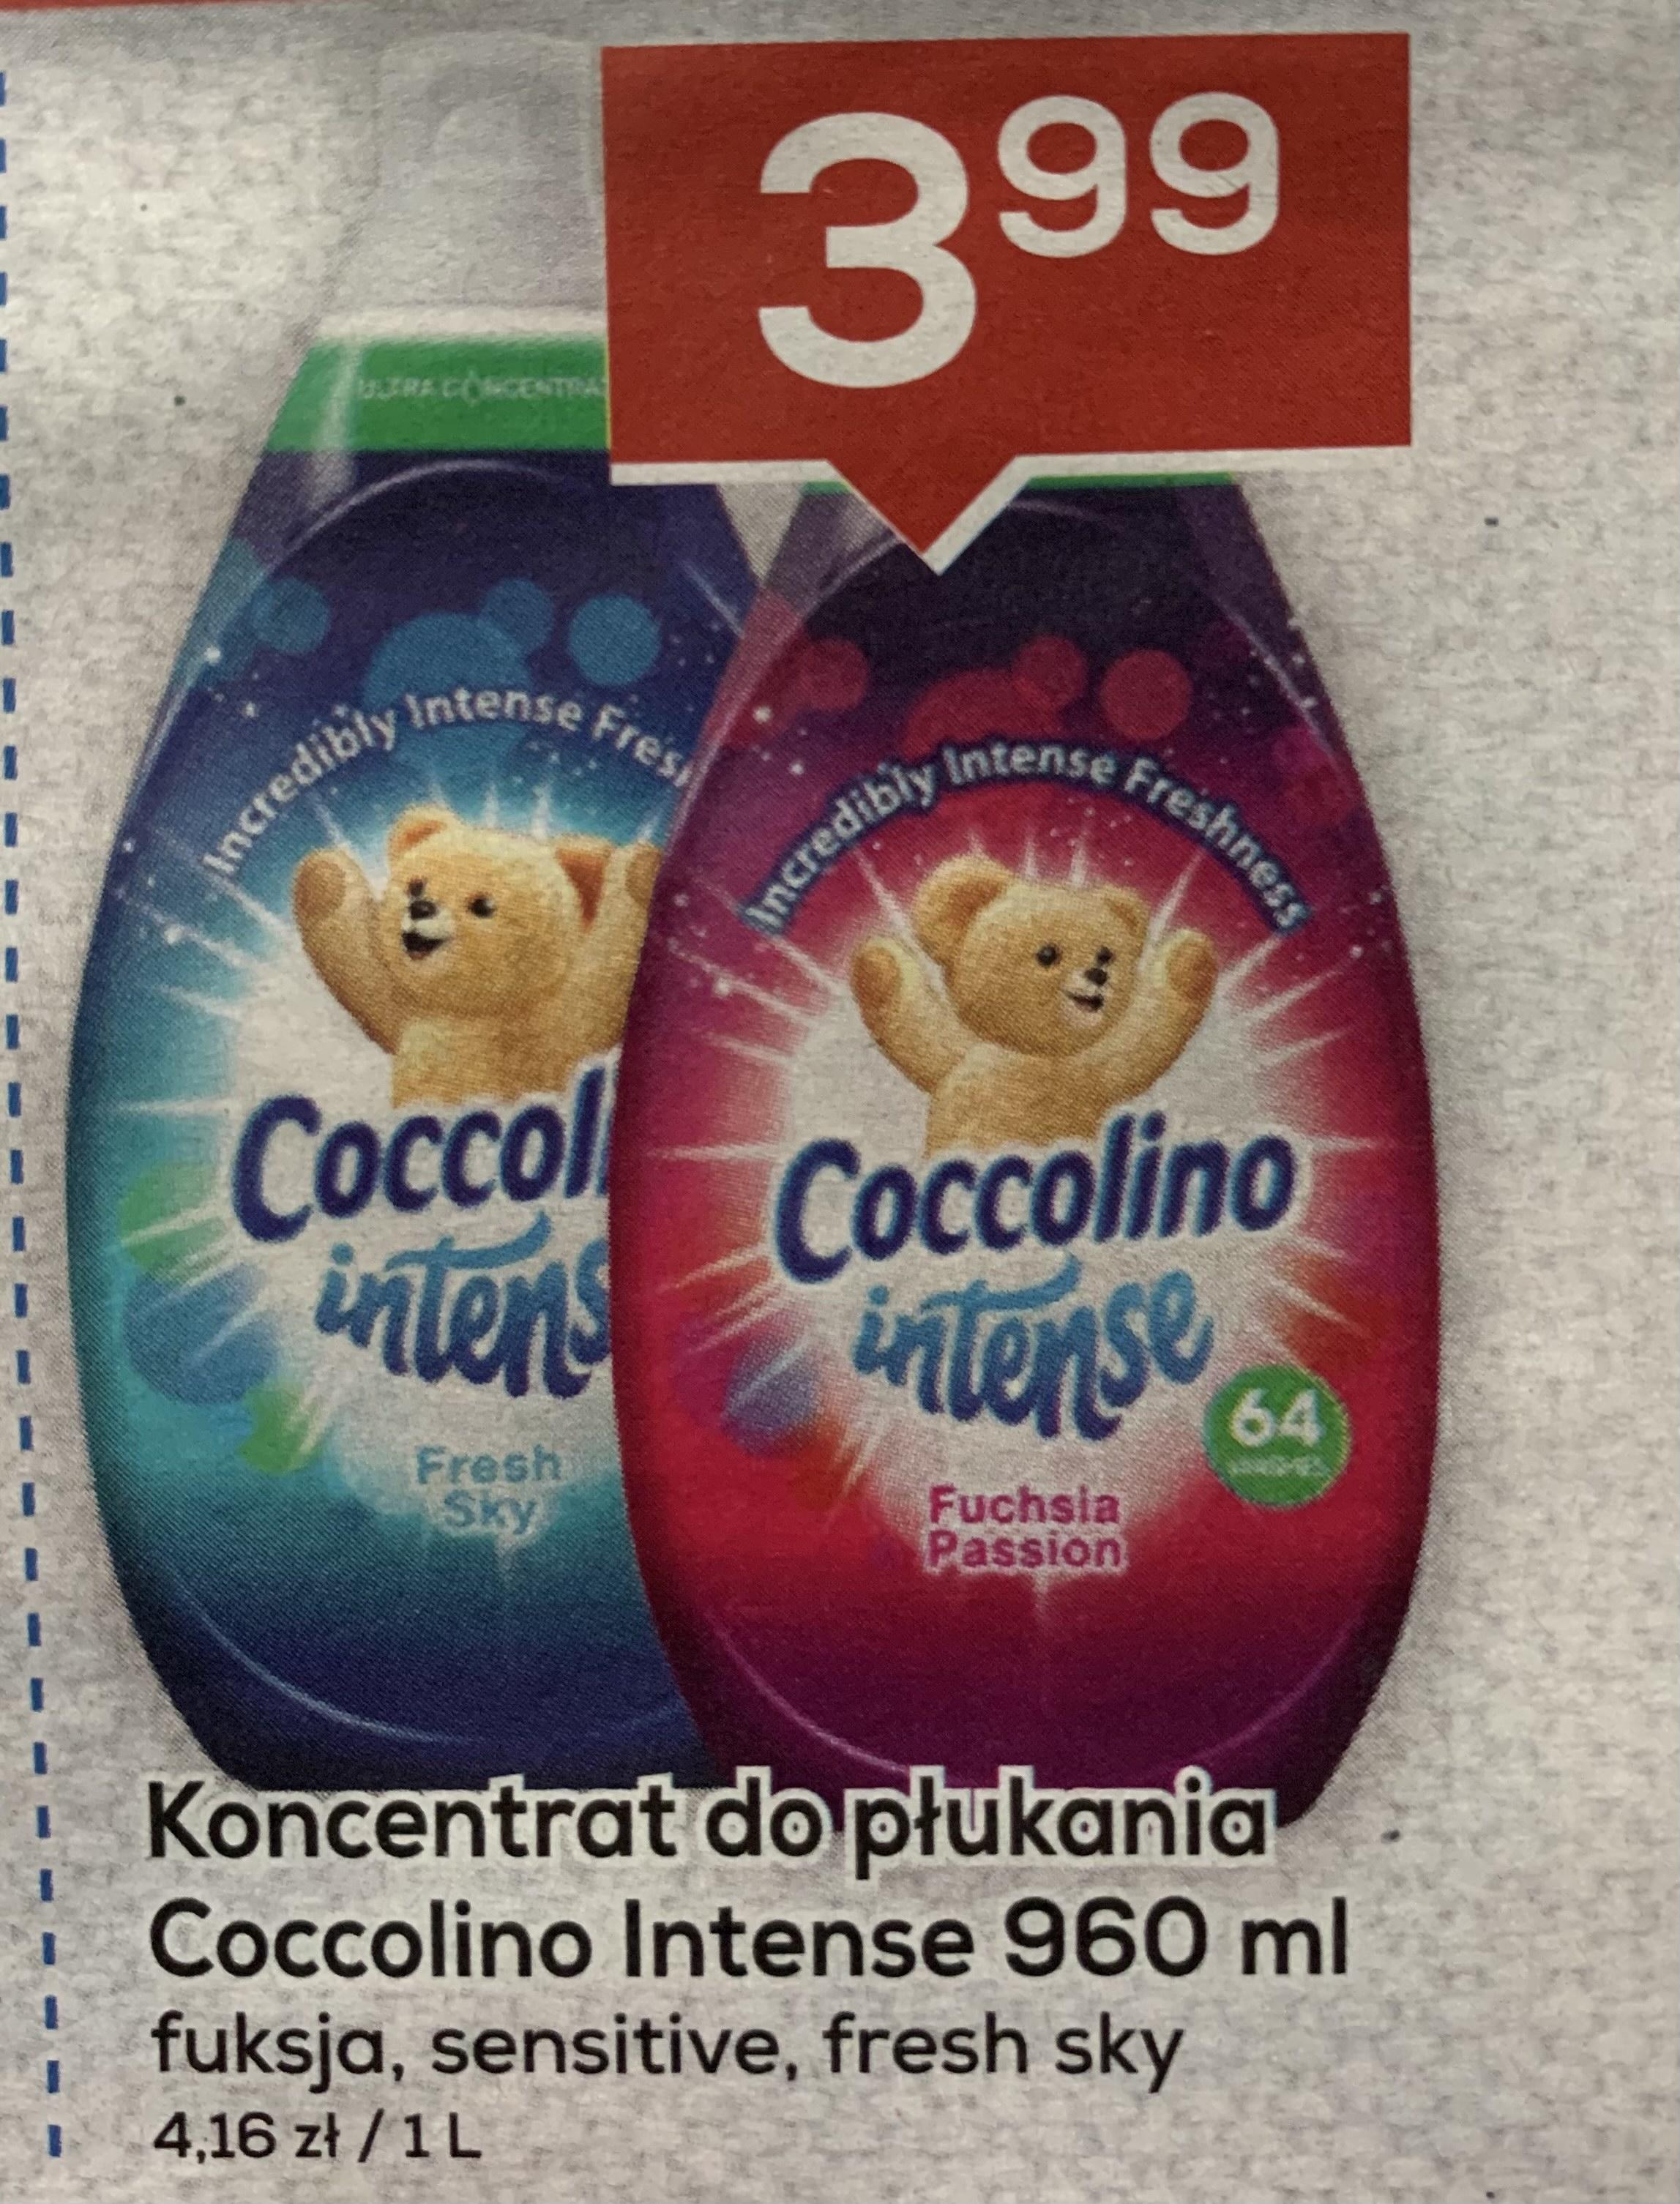 Koncentrat do płukania Coccolino Intense 960 ml - Lewiatan